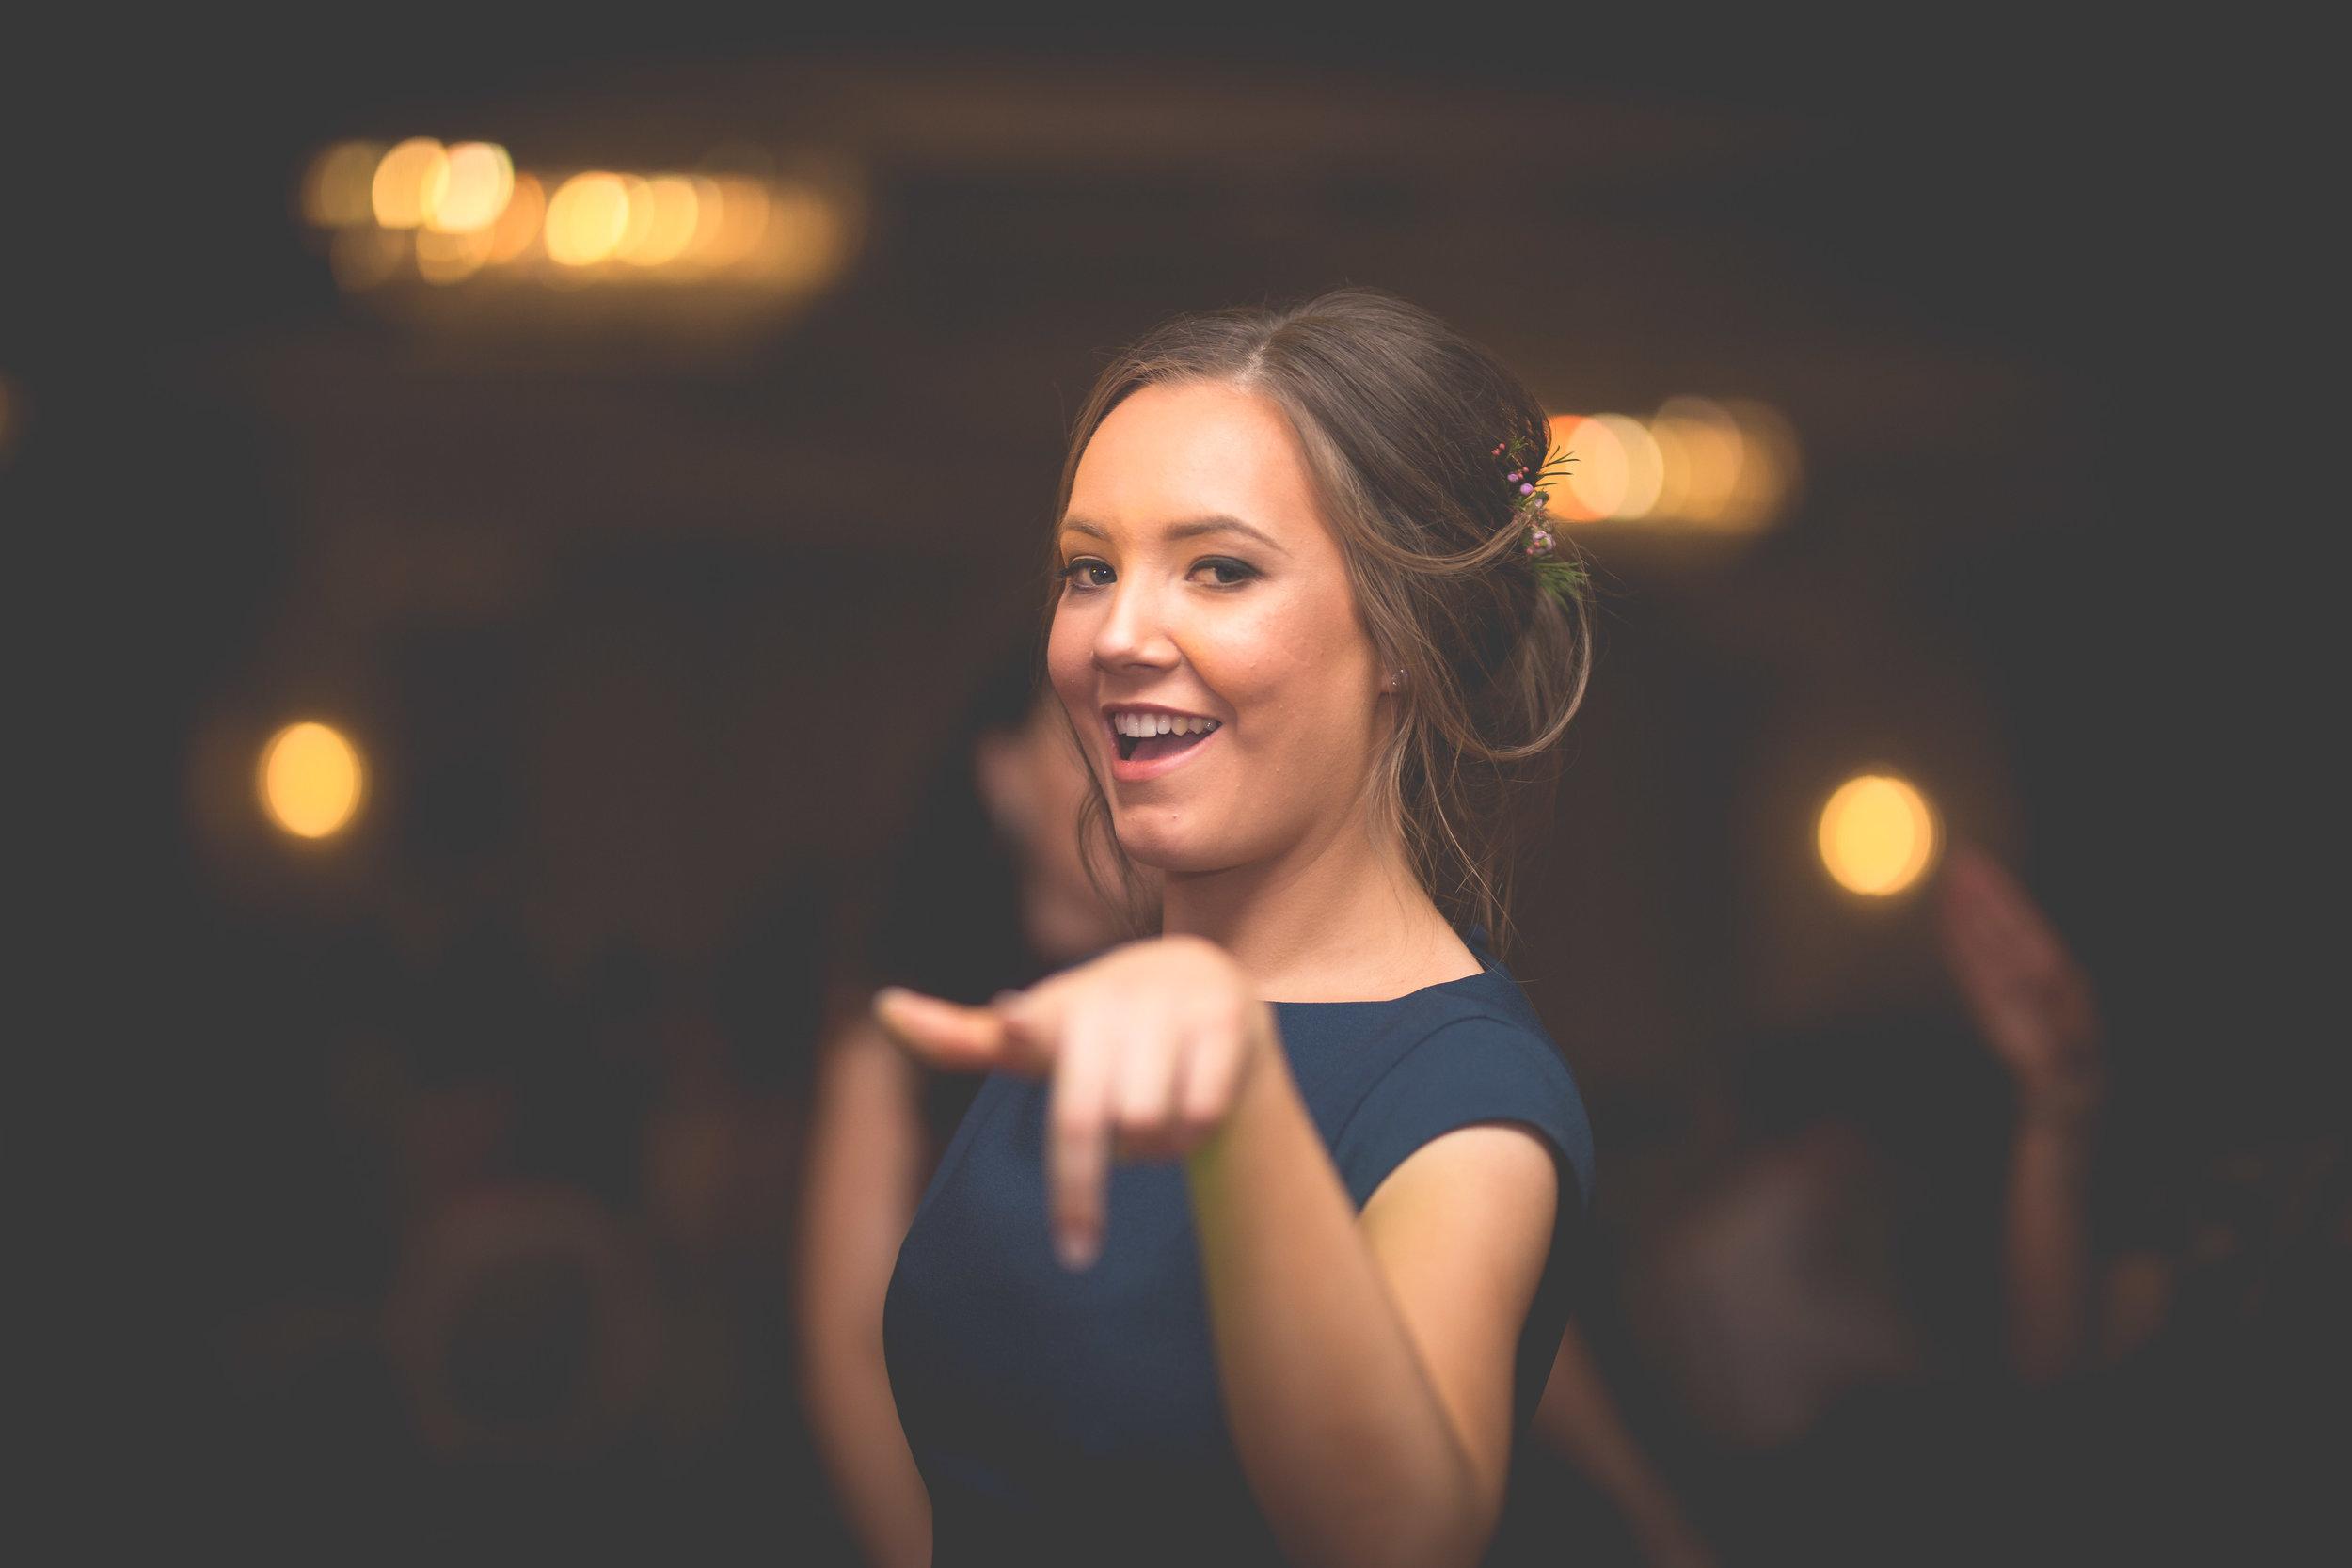 MaryJo_Conor_Mageean_Dancing-30.jpg